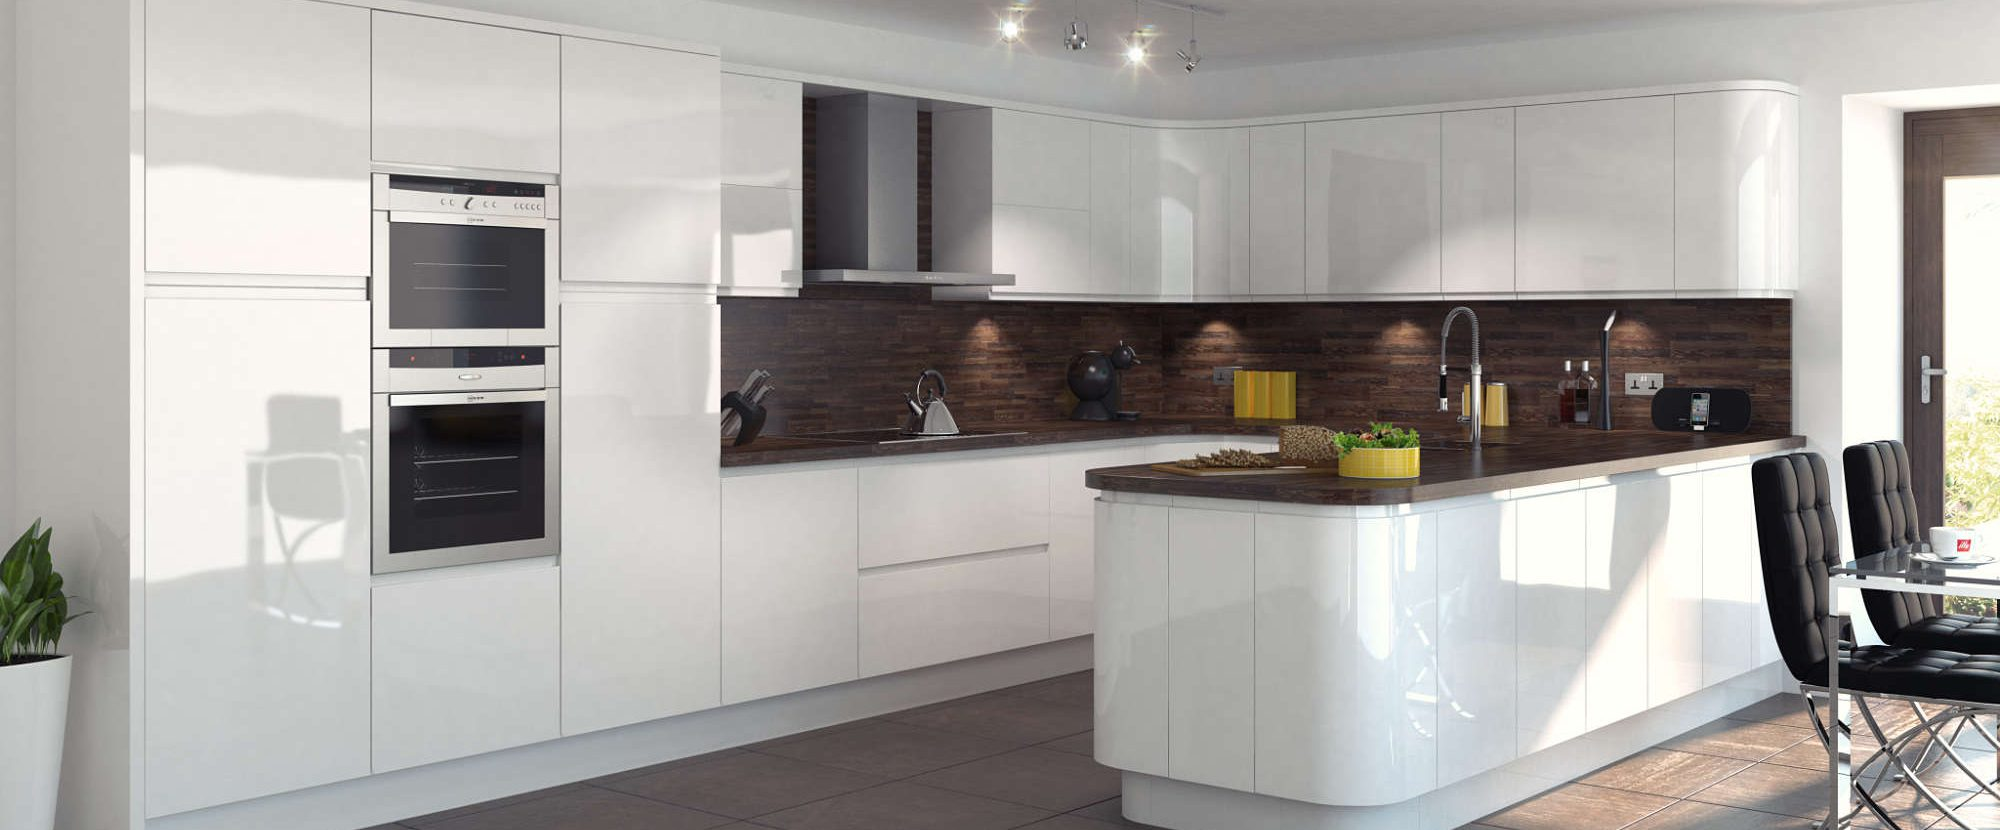 gloss white inline kitchen